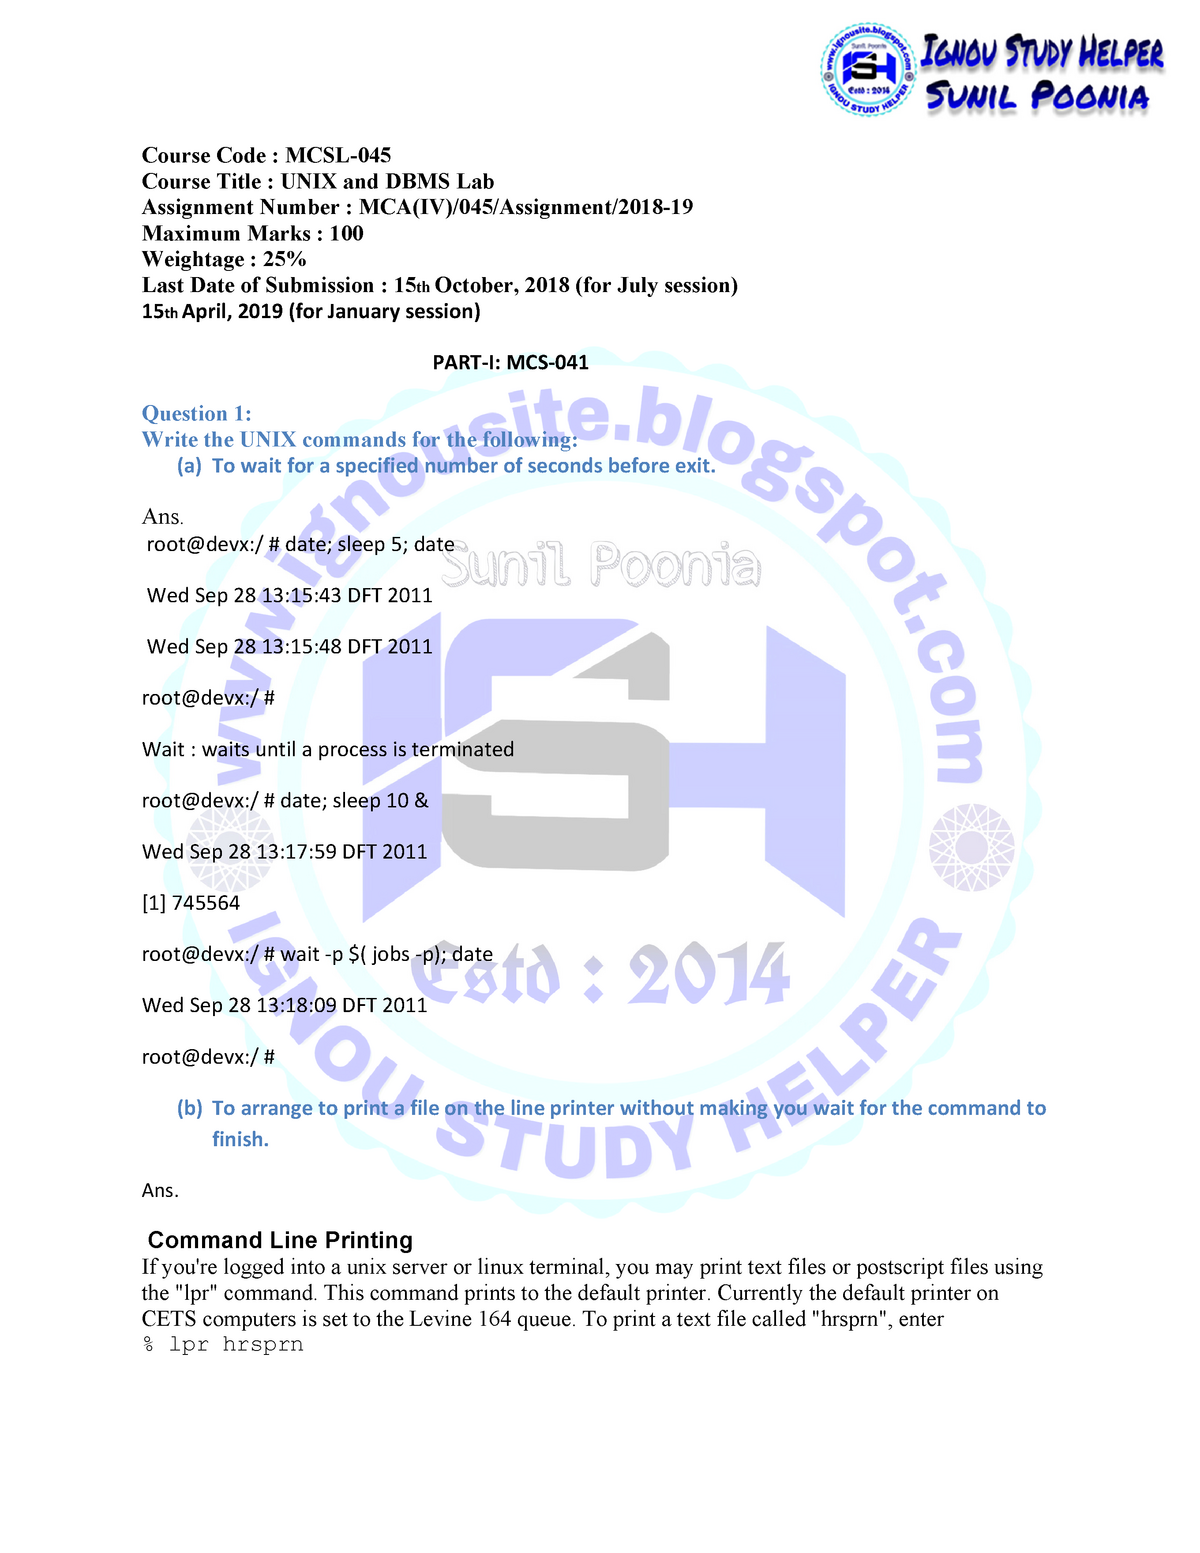 MCSL-045 2018-19 - UNIX and DBMS LAB MCSL-045 - ignou - StuDocu